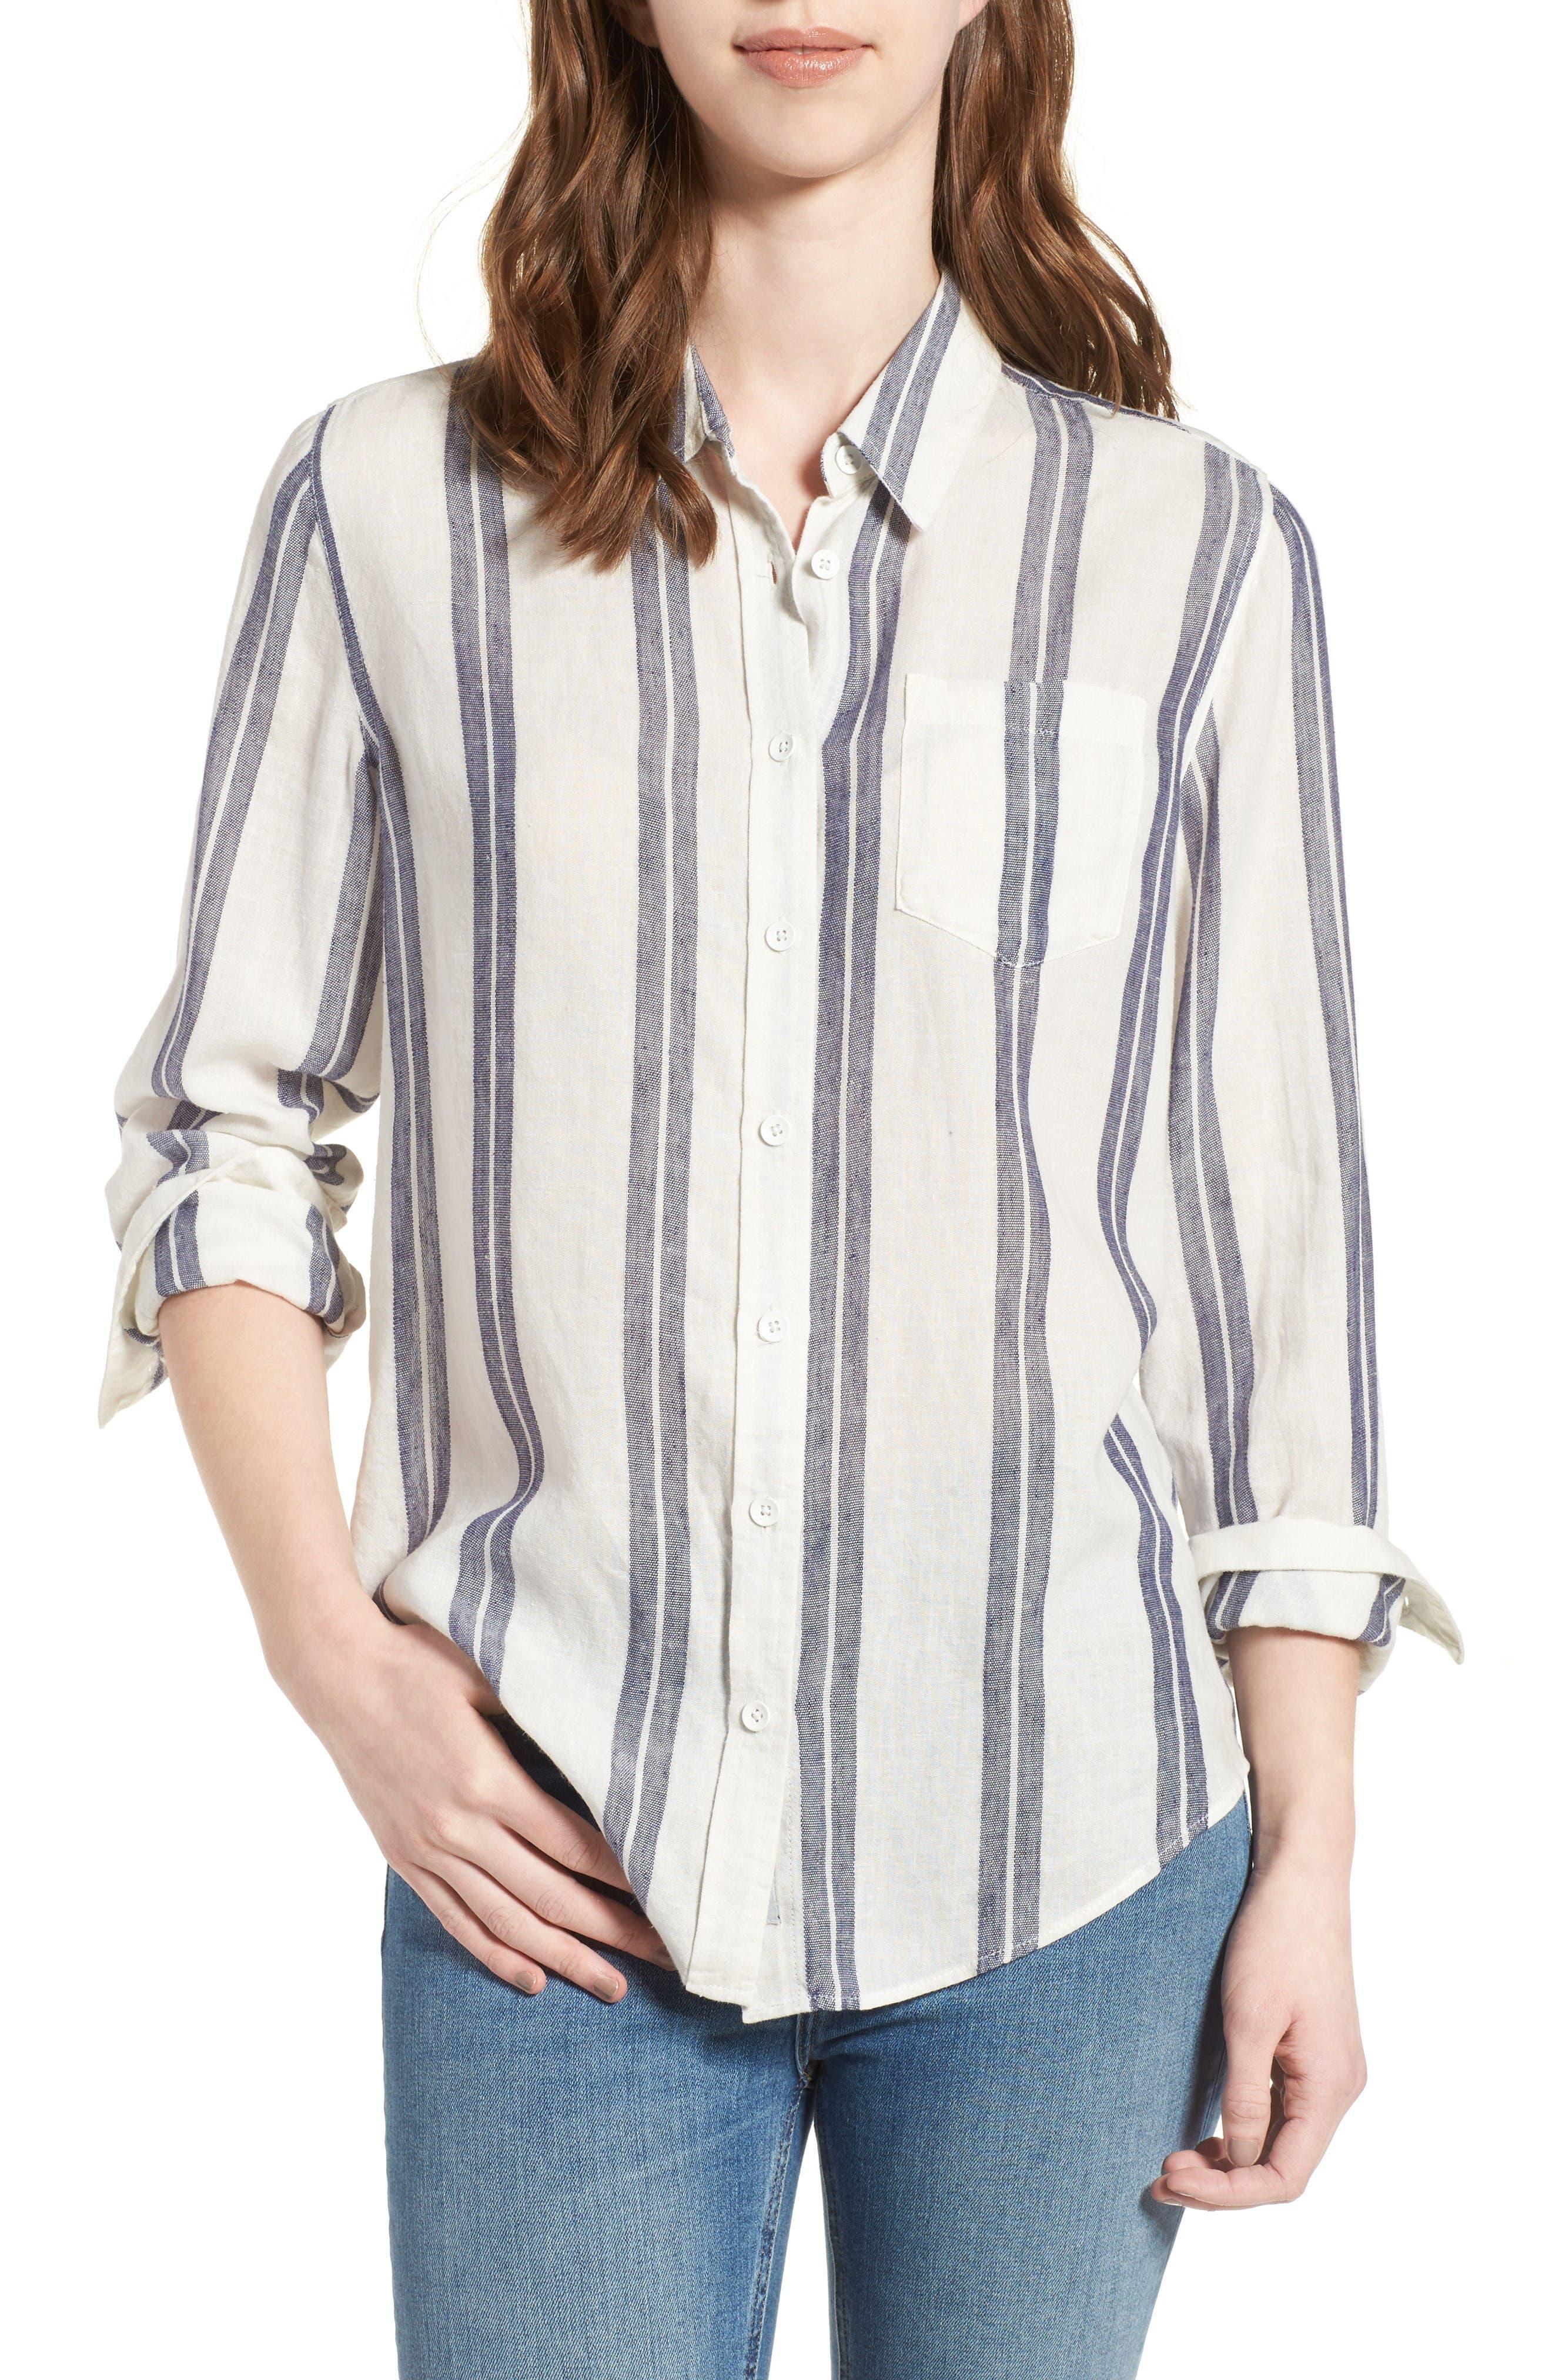 Main Image - DL1961 Mercer & Spring Shirt